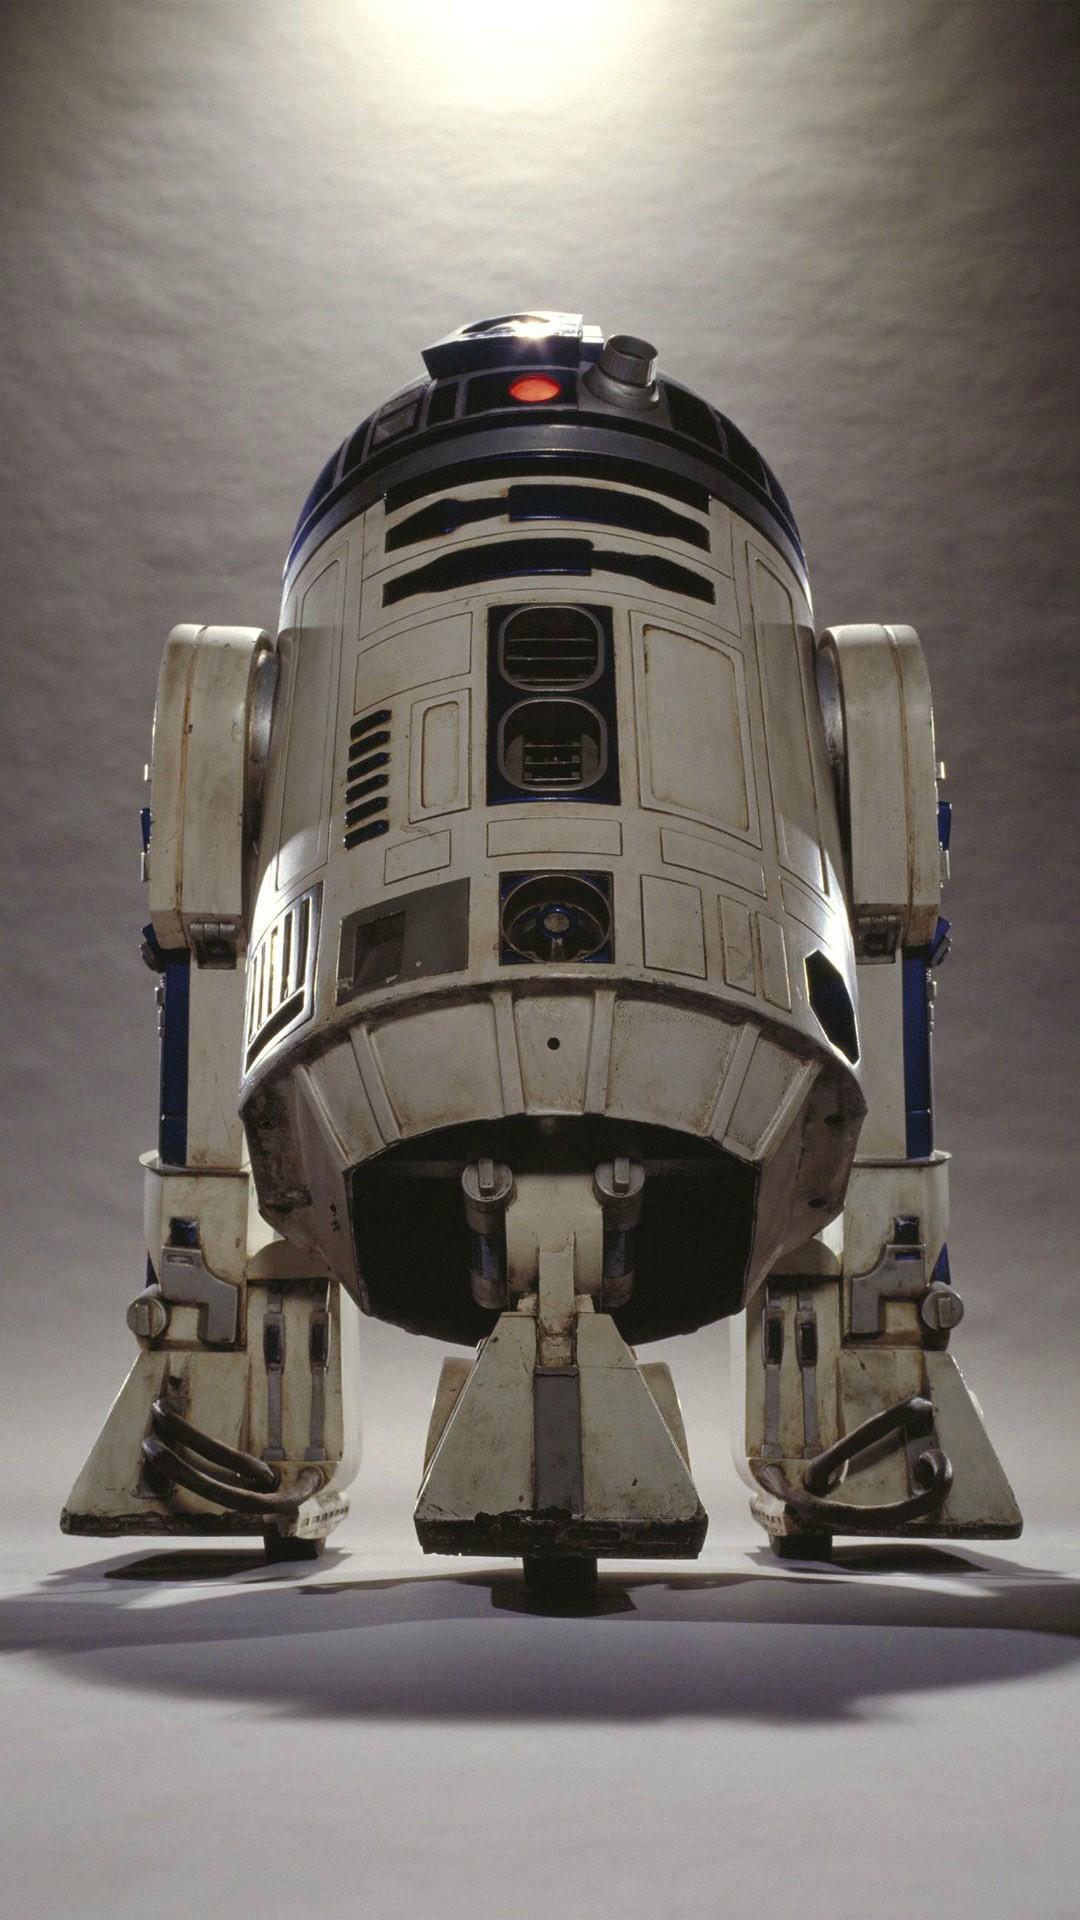 Empire - Star Wars Wallpaper - Apps on Google Play